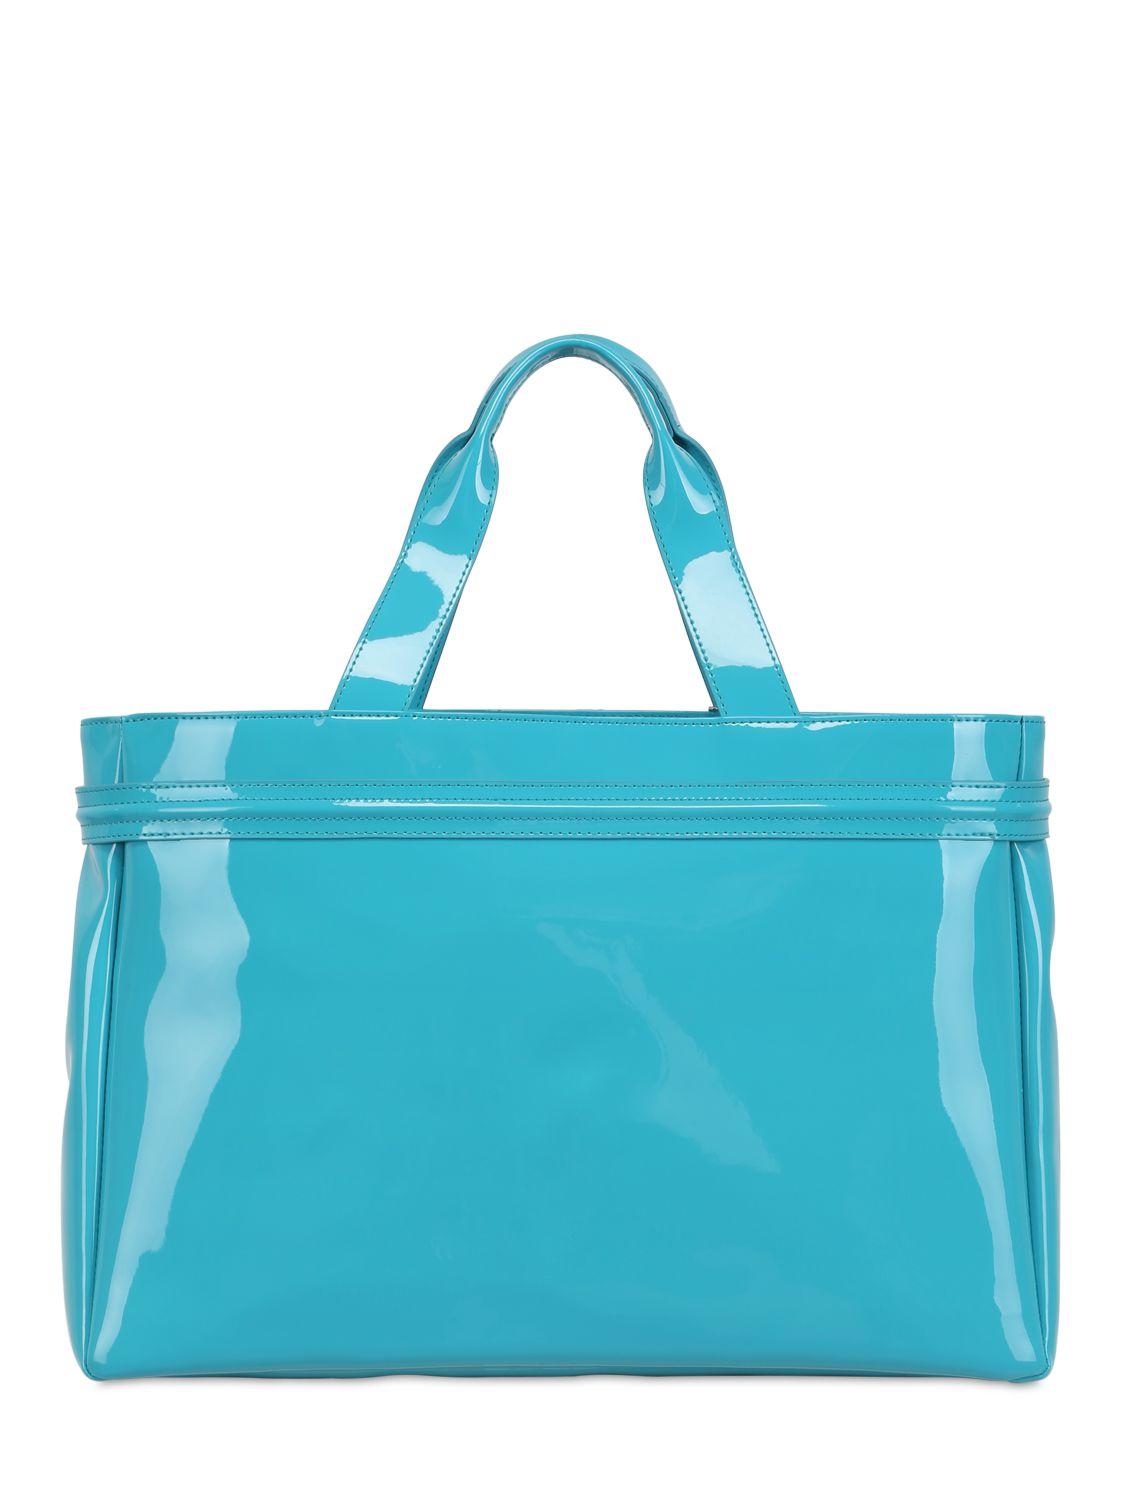 Armani jeans Medium Embossed Logo Patent Vinyl Bag in Blue  2962d56a0eae1